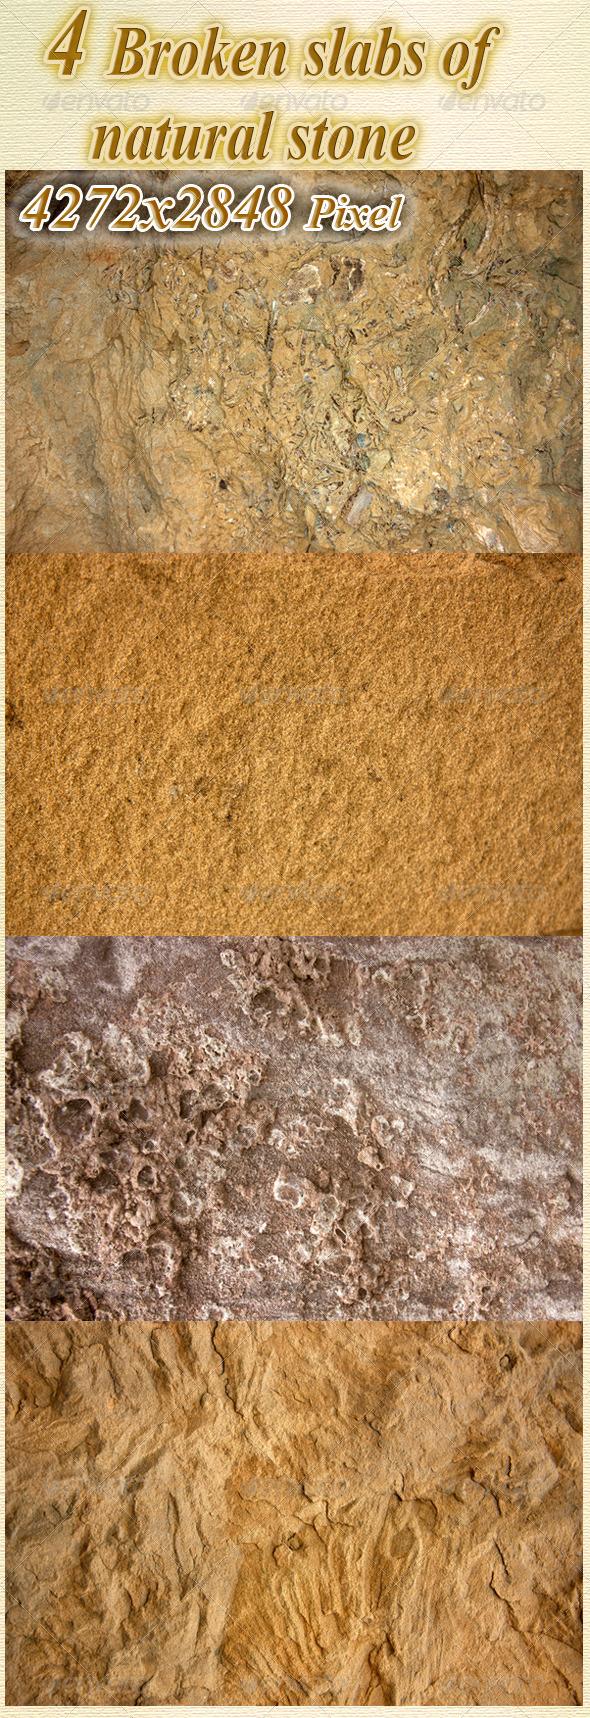 GraphicRiver Broken Slabs of Natural Stone 3384055